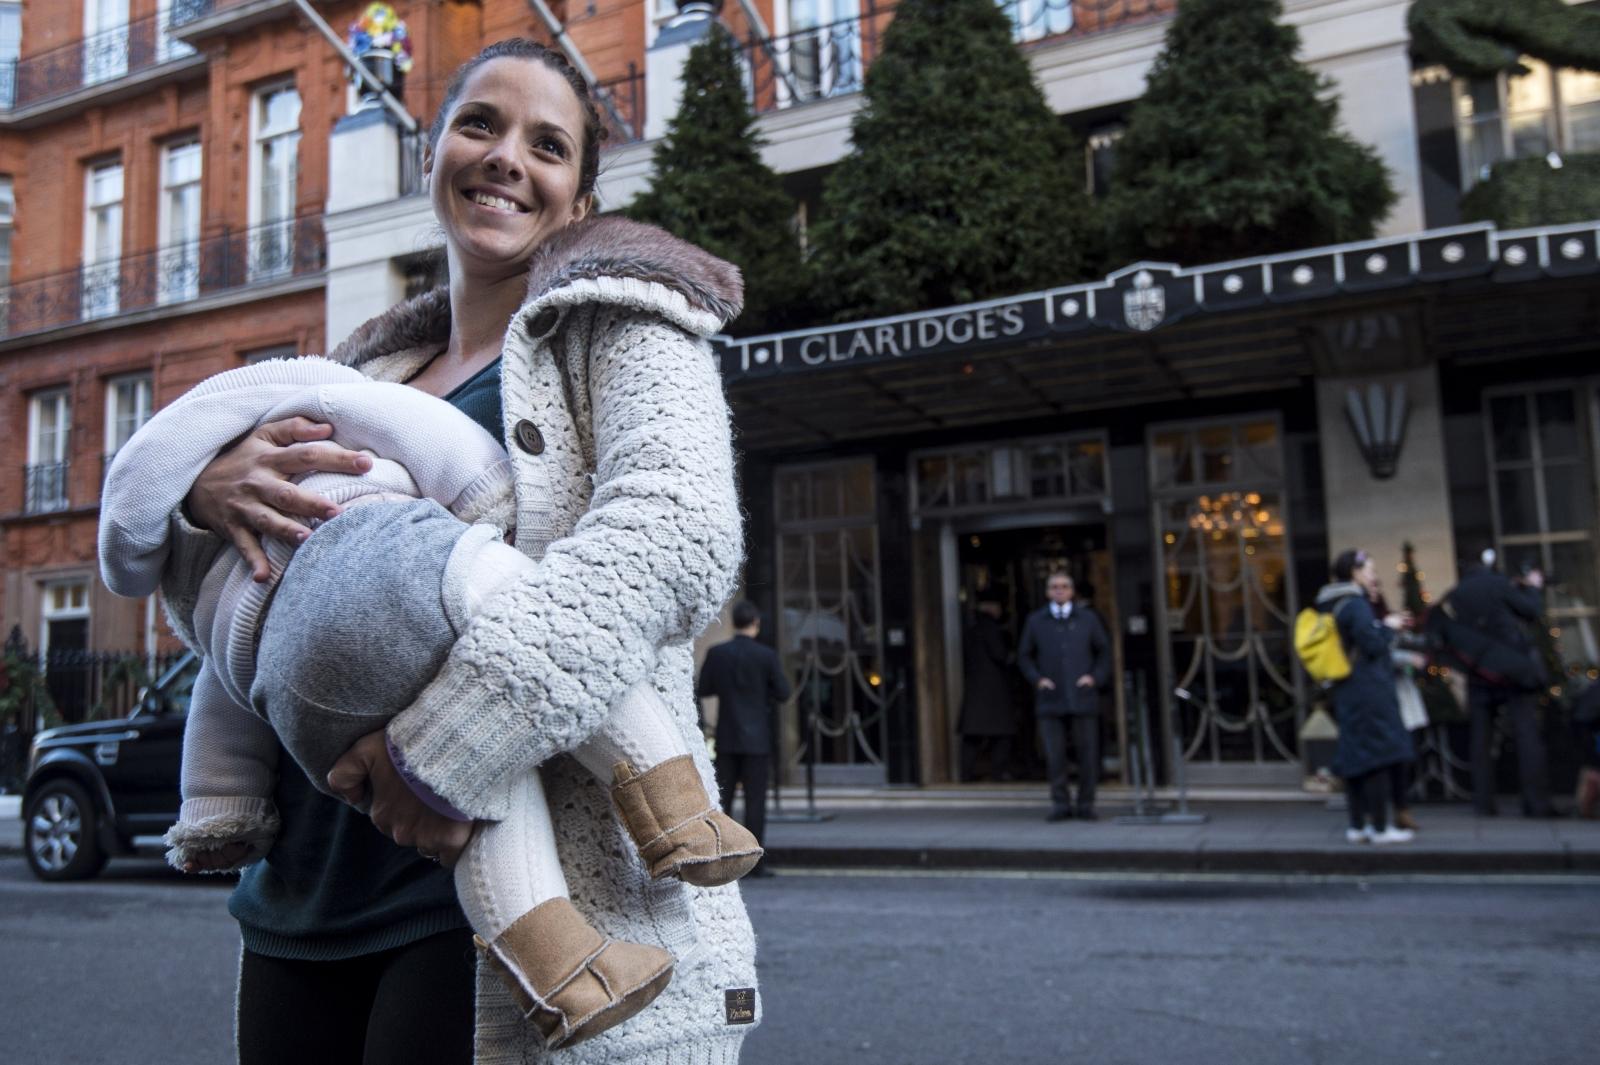 Breastfeeding MPs Commons